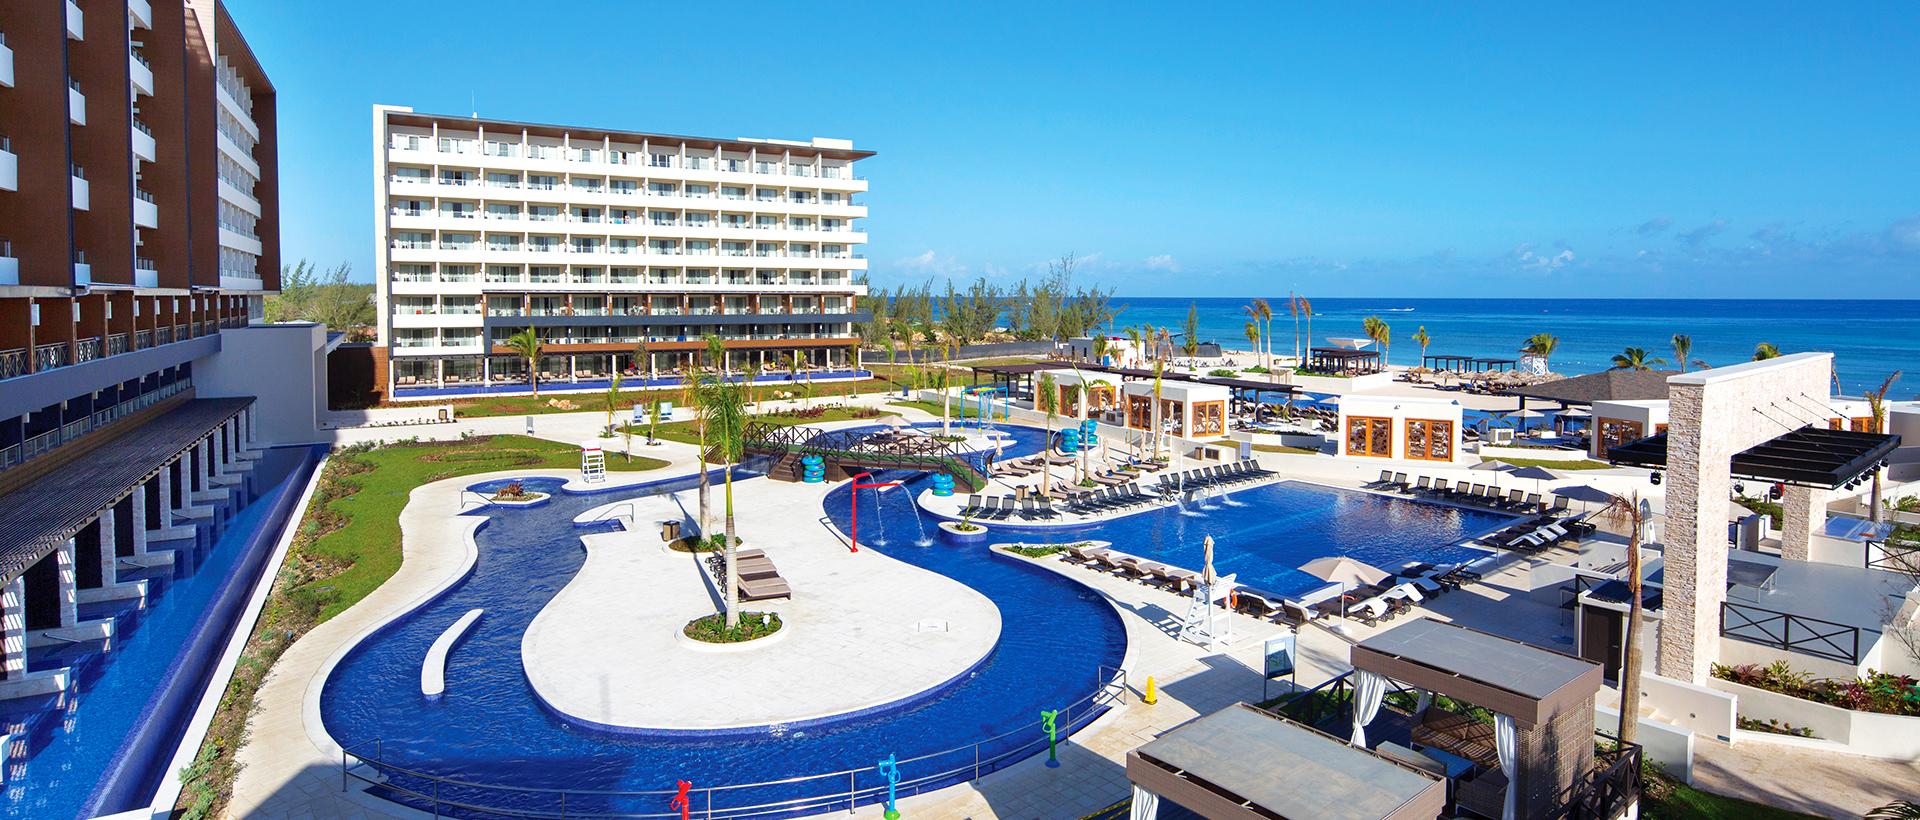 Royalton Blue Waters Montego Bay All-Inclusive Resort